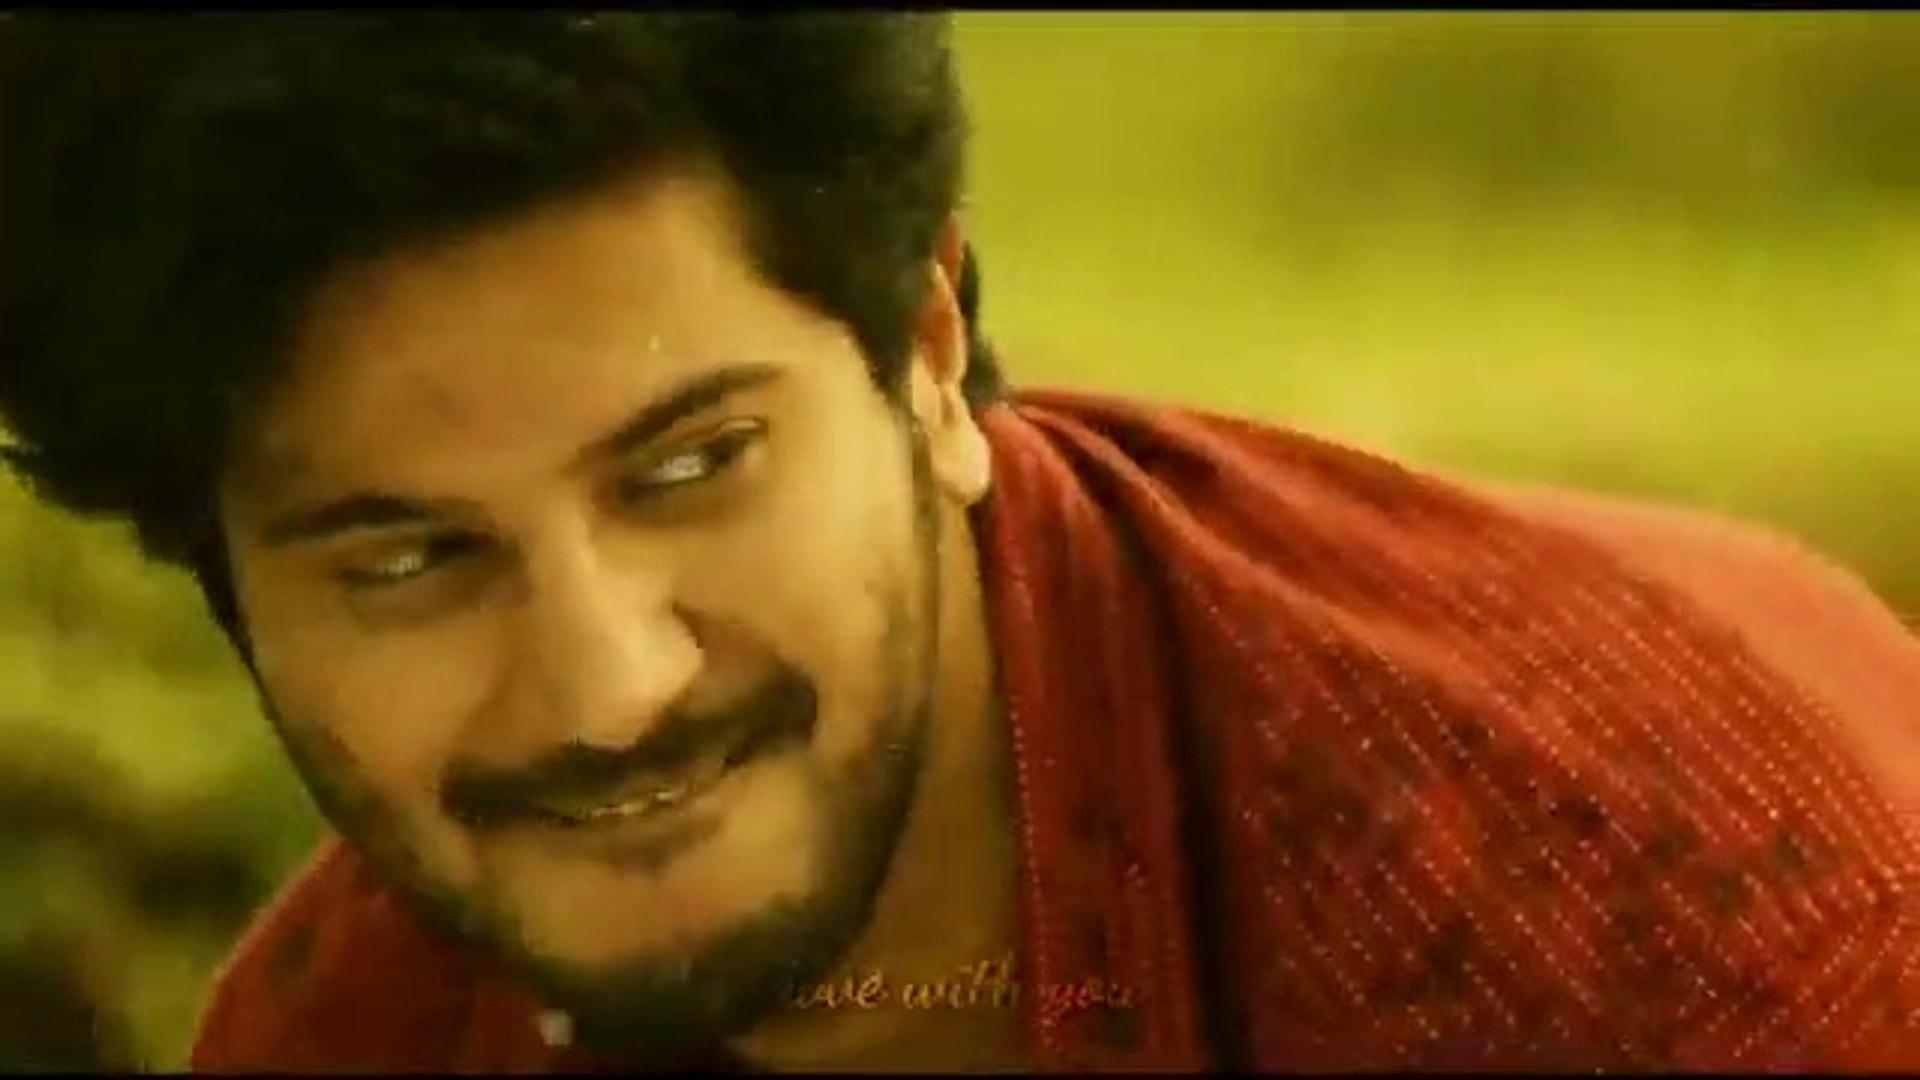 Tamil loveWhatsApp status /love feeling WhatsApp status Tamil_love status